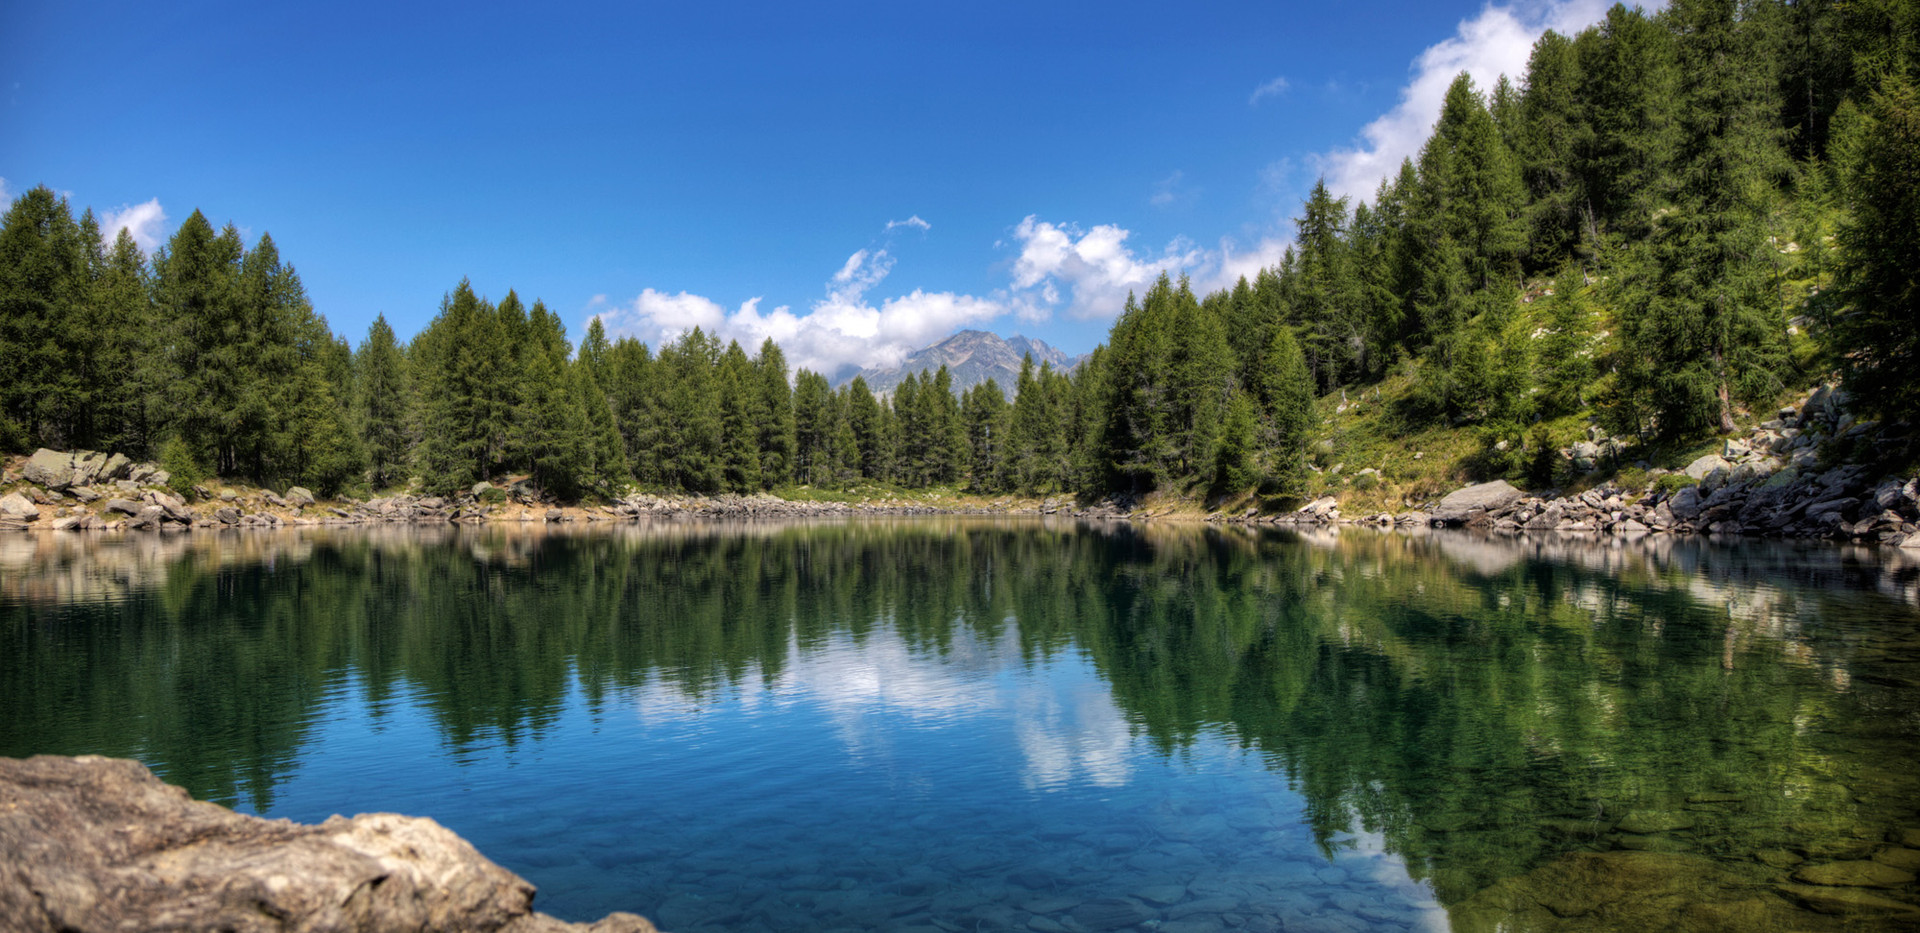 Lago-Azzurro-Madesimo-1.jpg